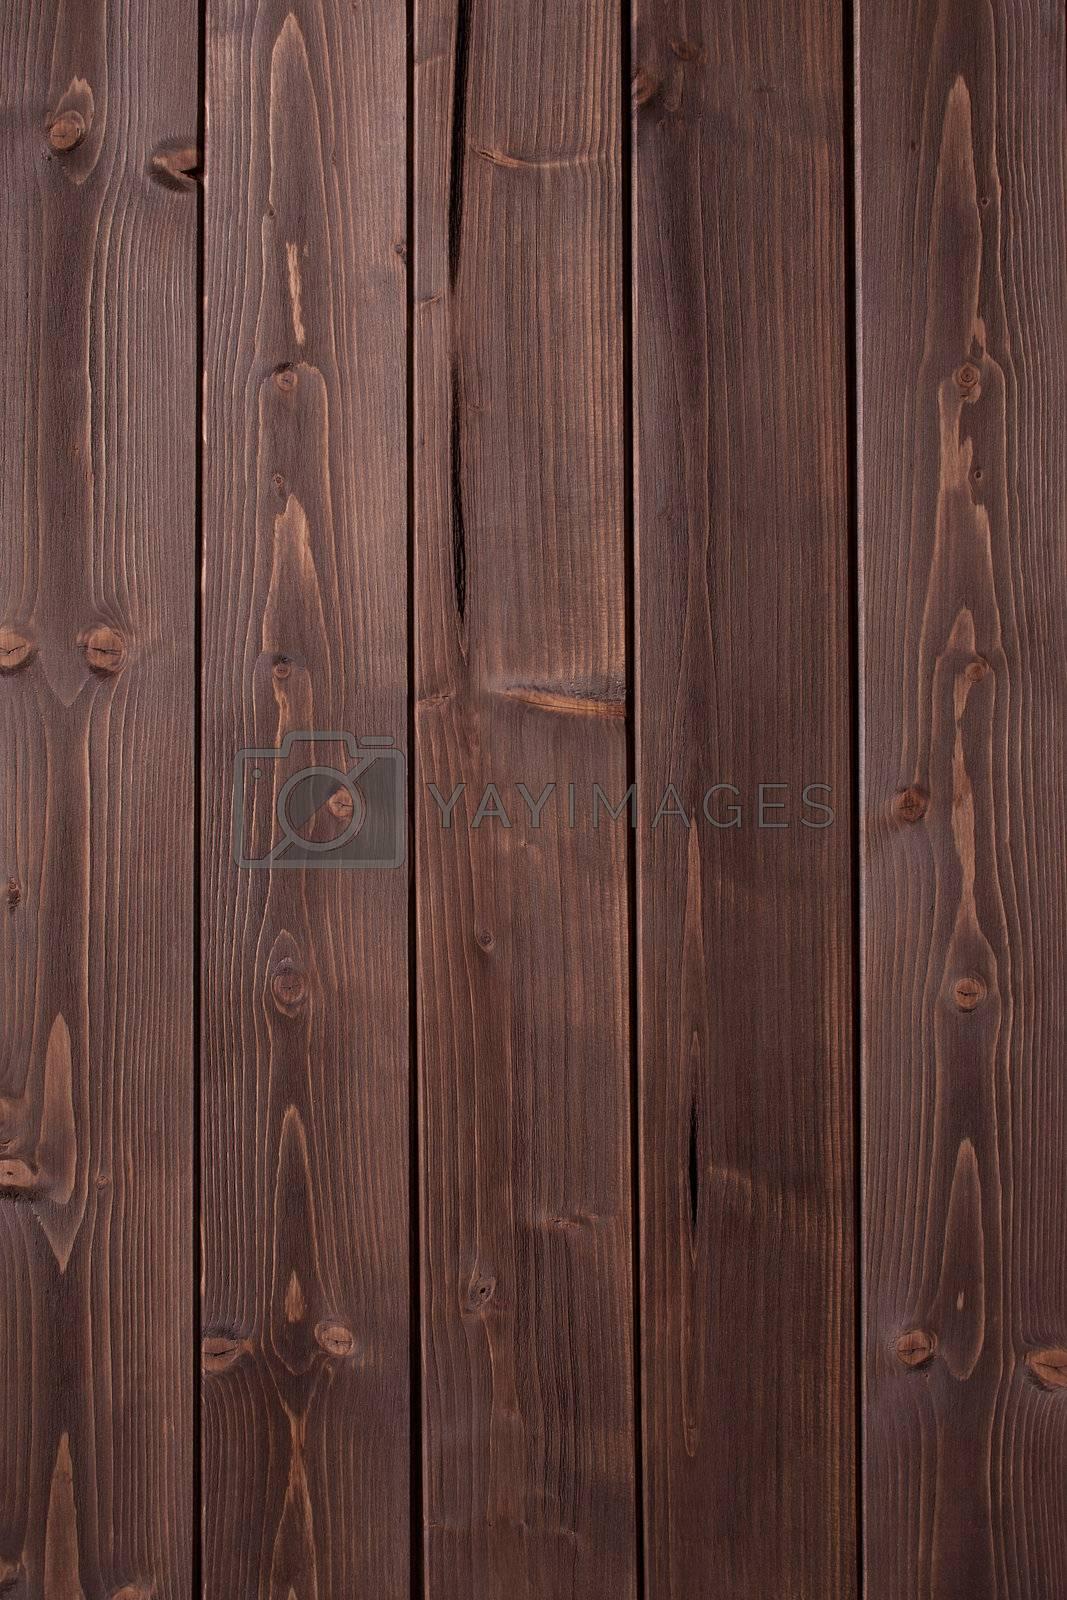 Dark chestnut panels wood surface material texture